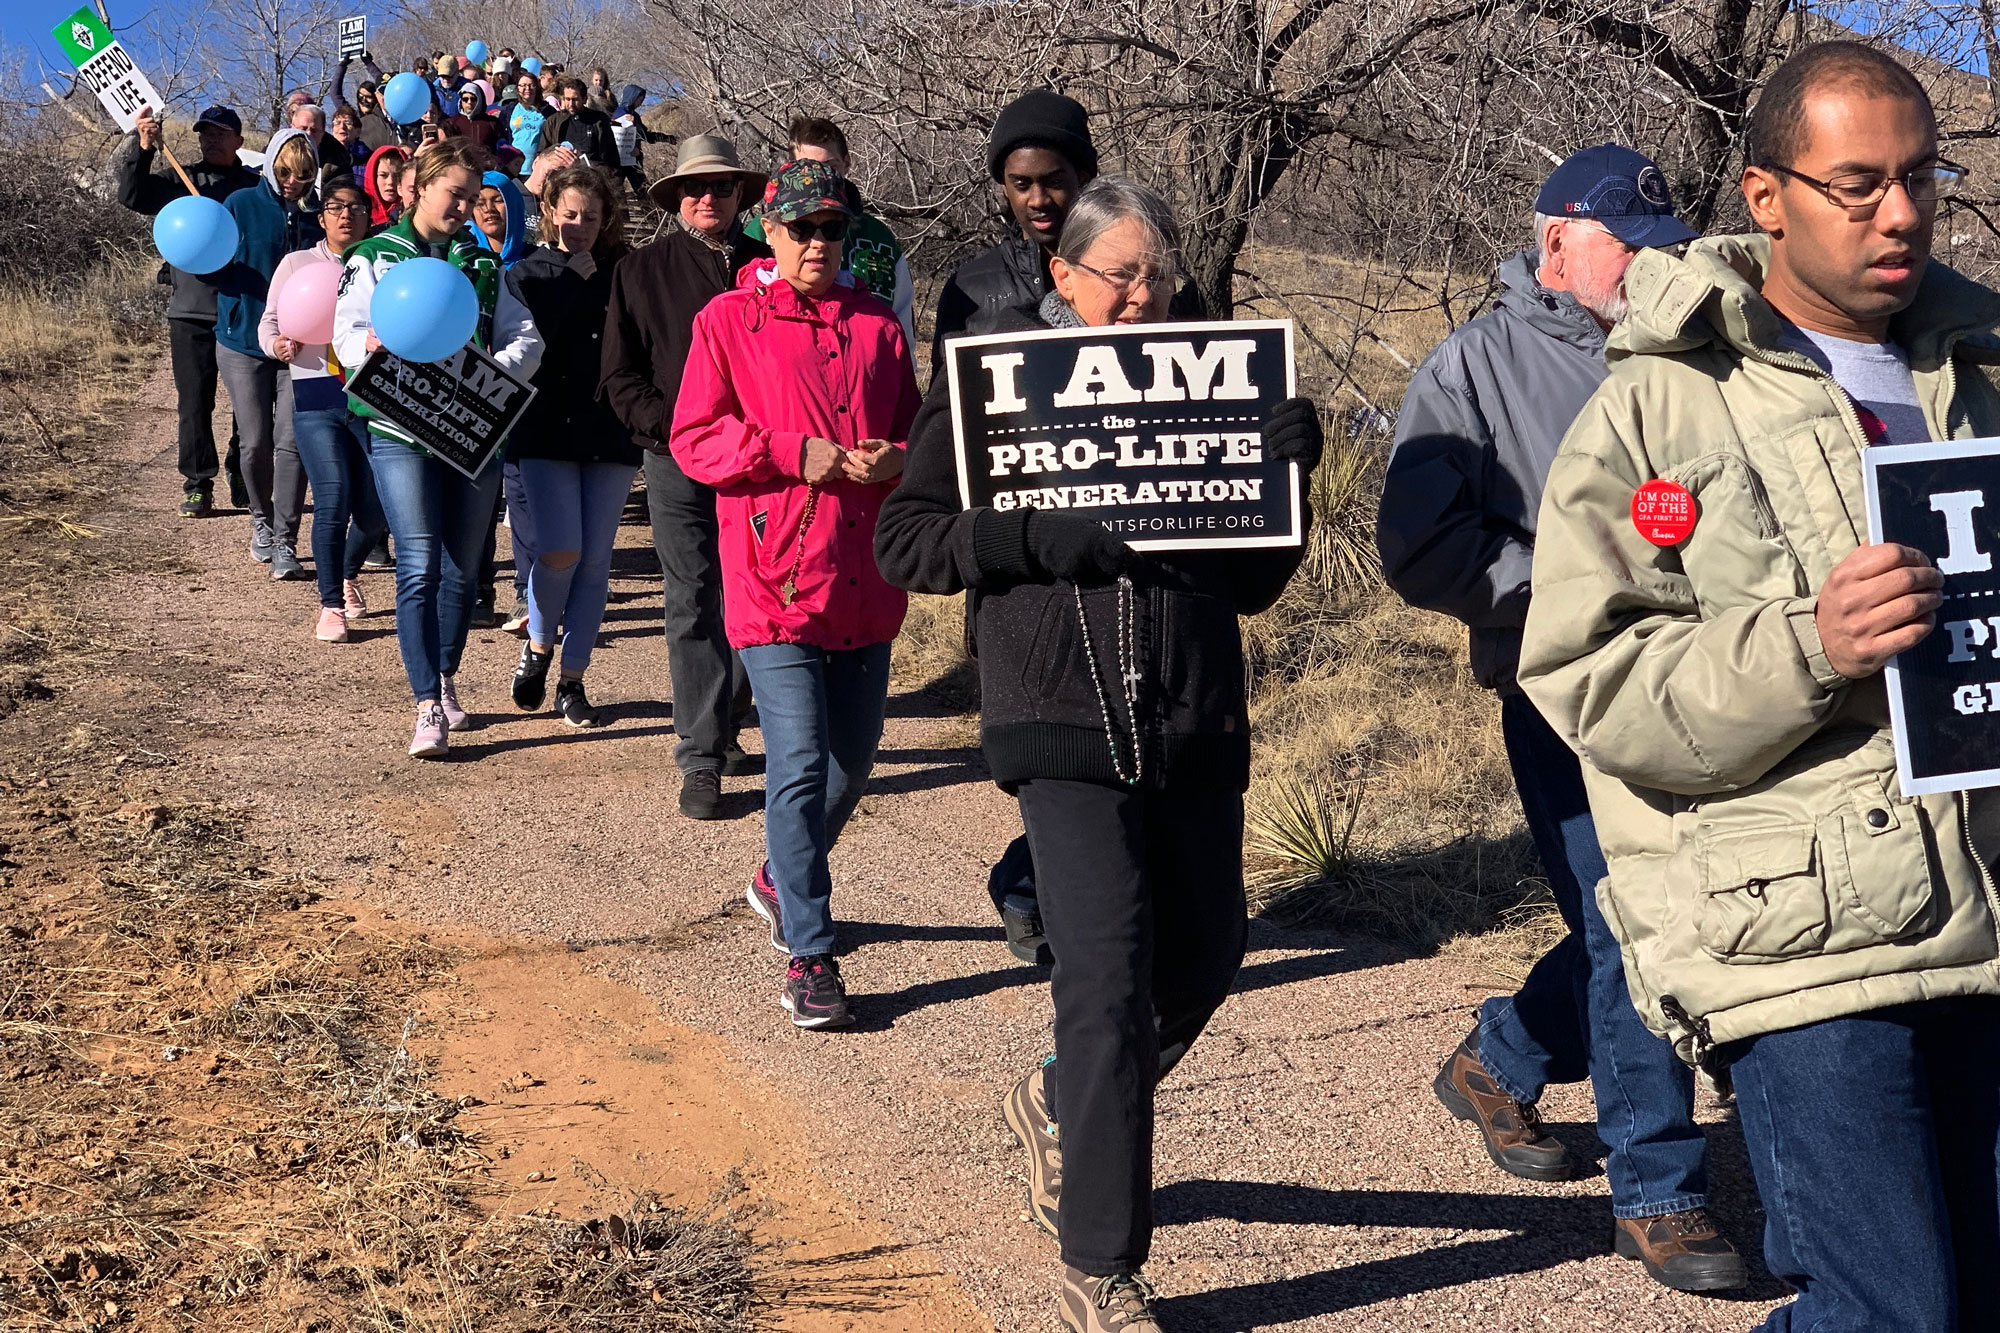 Photo: Colorado Spring March For Life 2019